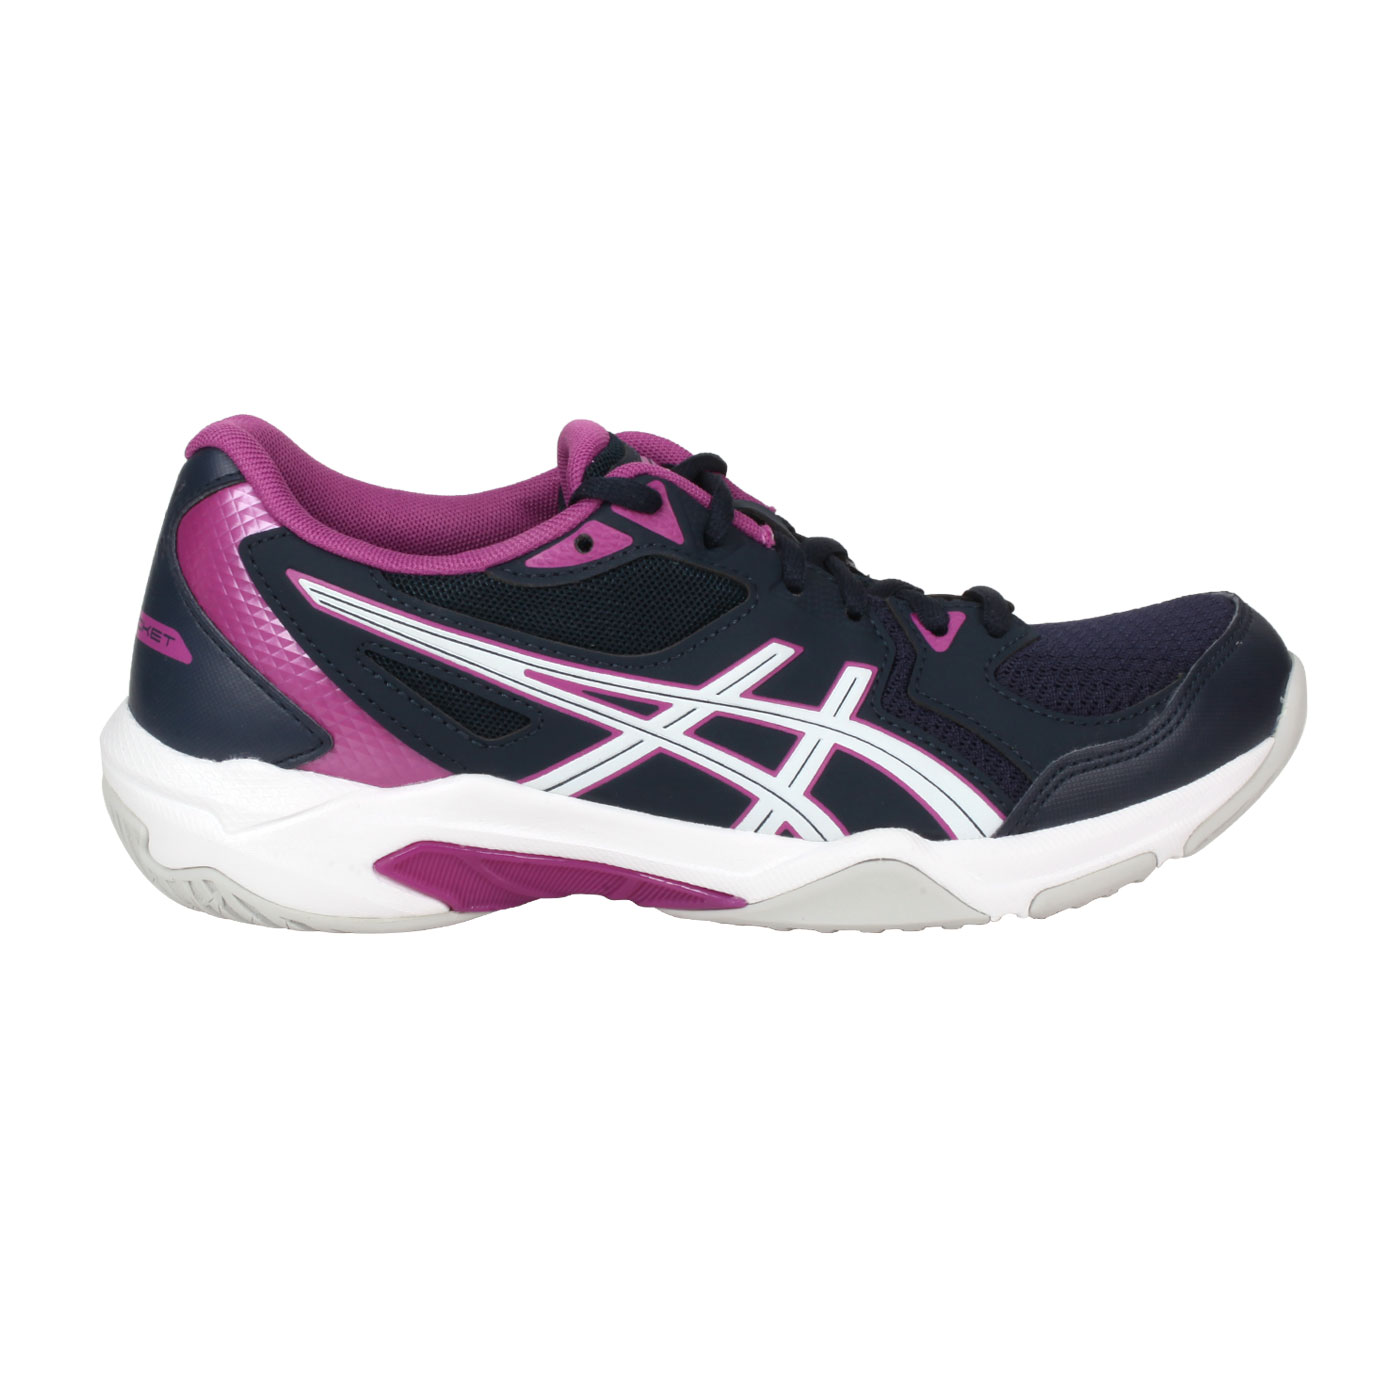 ASICS 女款排羽球鞋  @GEL-ROCKET 10@1072A056-400